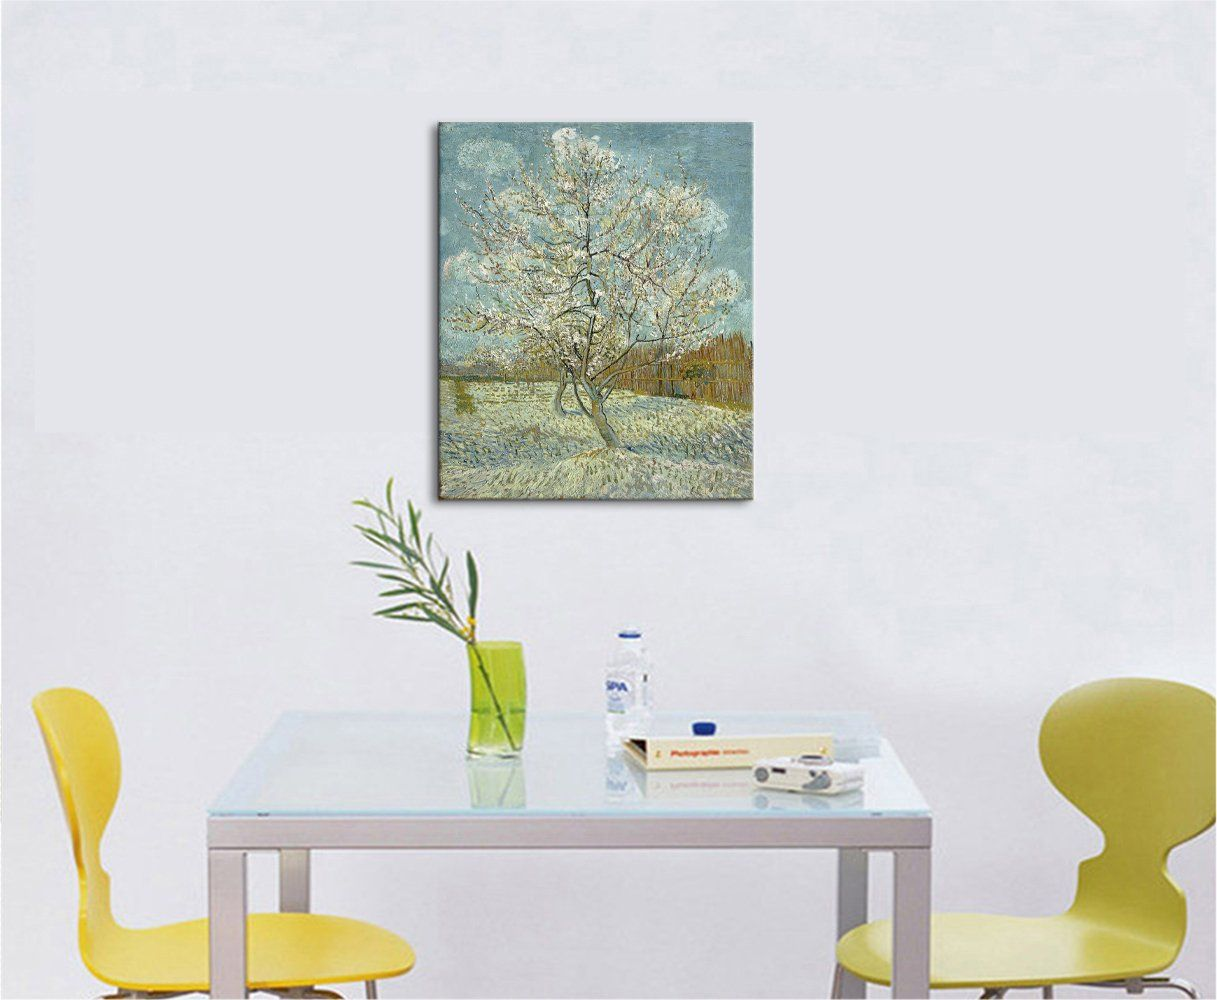 Peach Tress oil Paint By Van Gogh Re Print On Framed Canvas Wall Art Home Decor